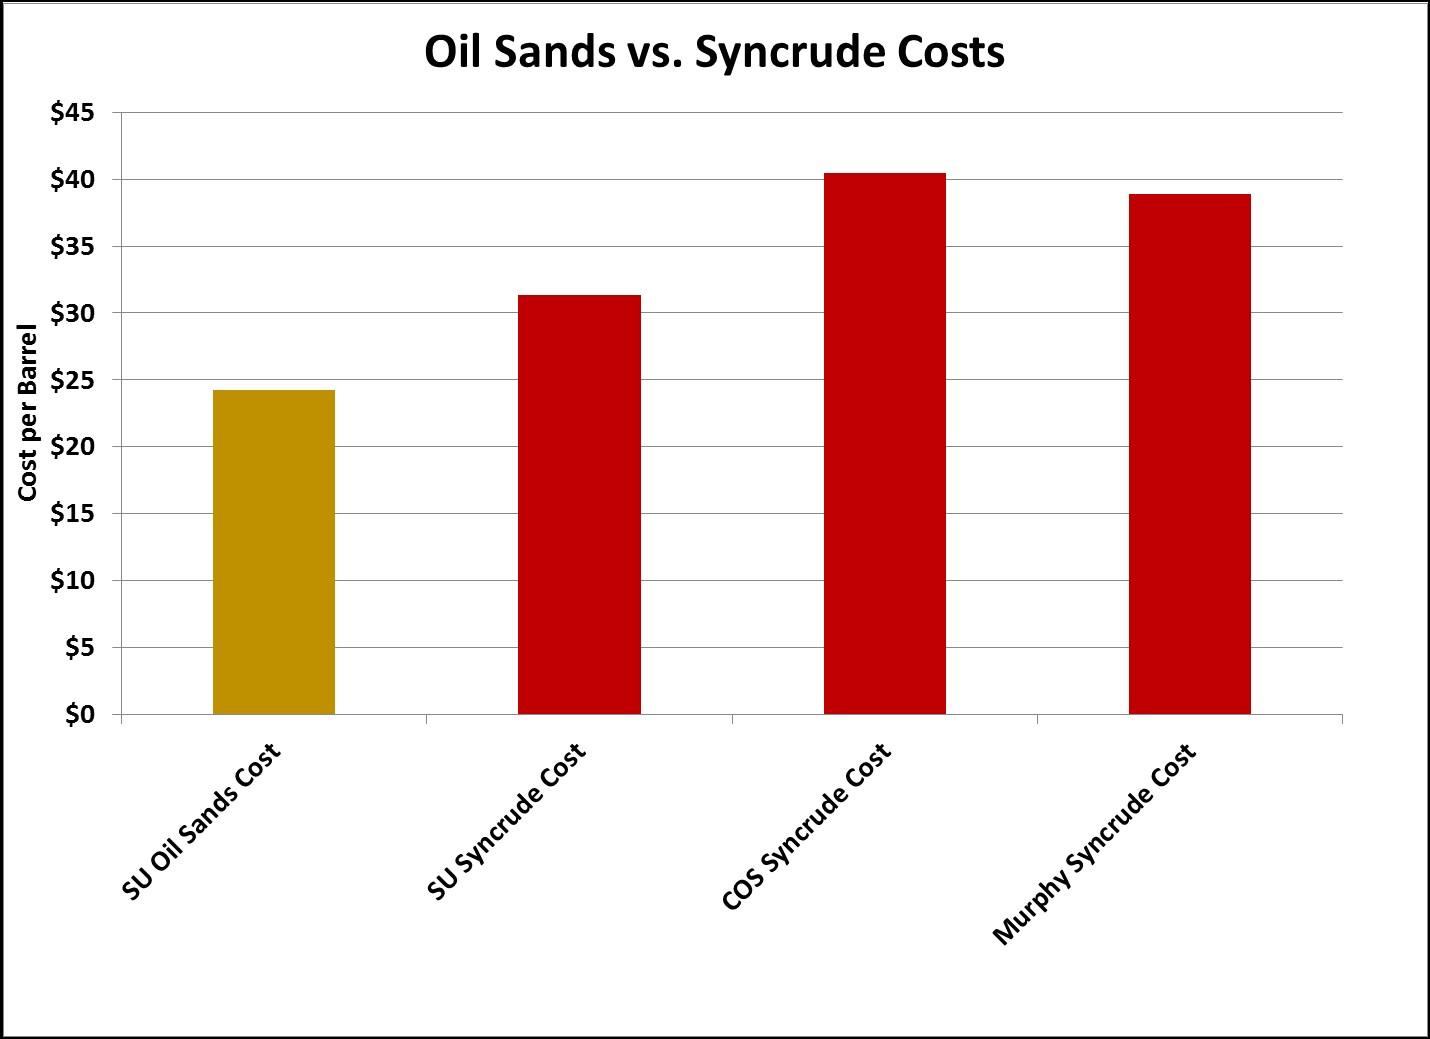 Syncrude Cost per Barrel